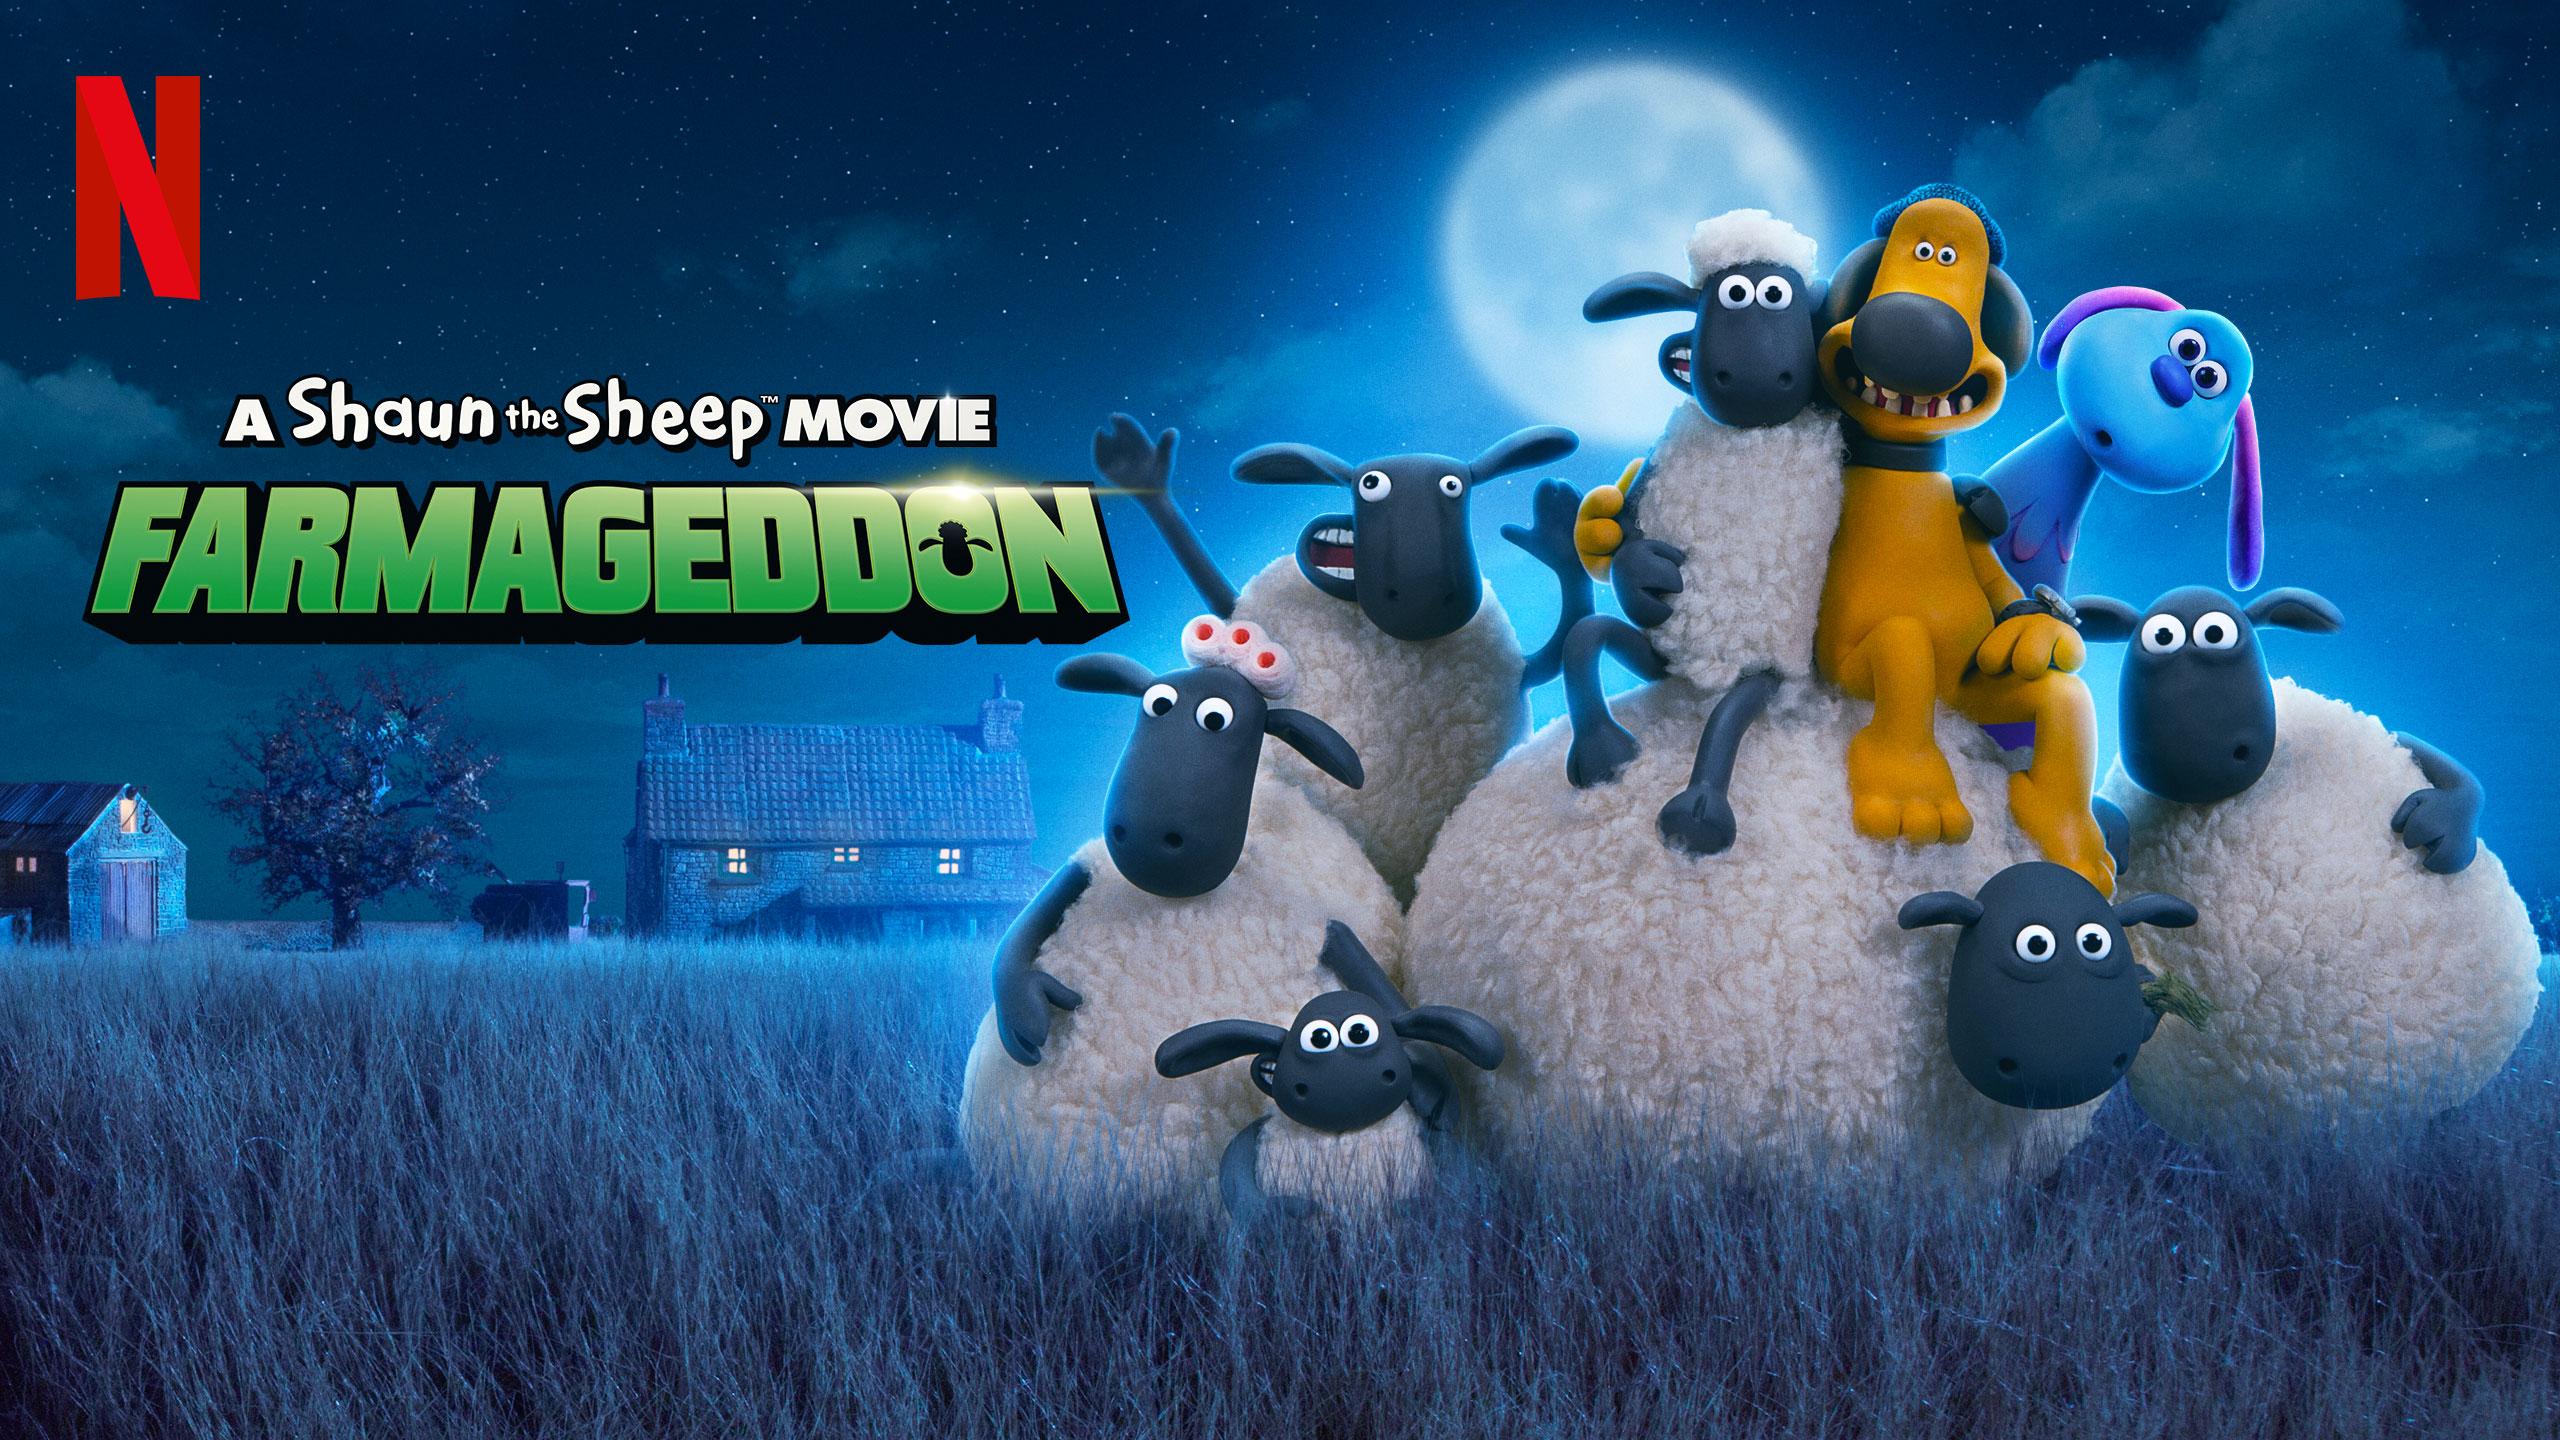 A Shaun the Sheep Movie: Farmageddon | Netflix HDA Concept, Finishing & Illustration